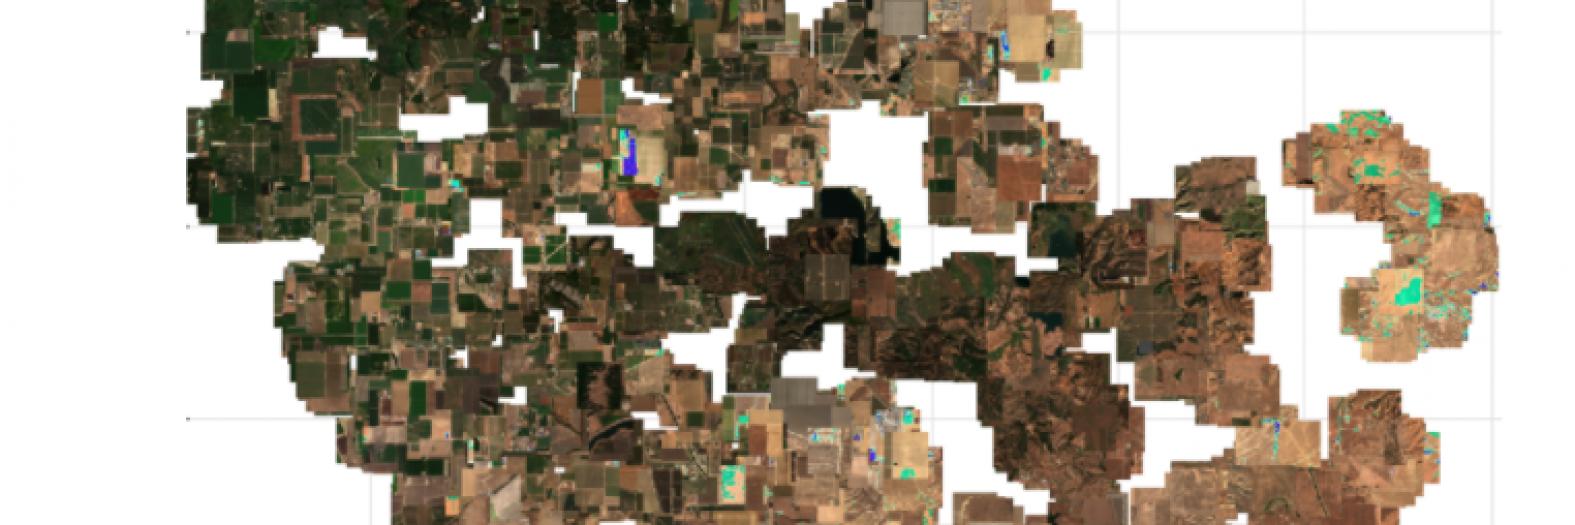 Labelling Satellite images